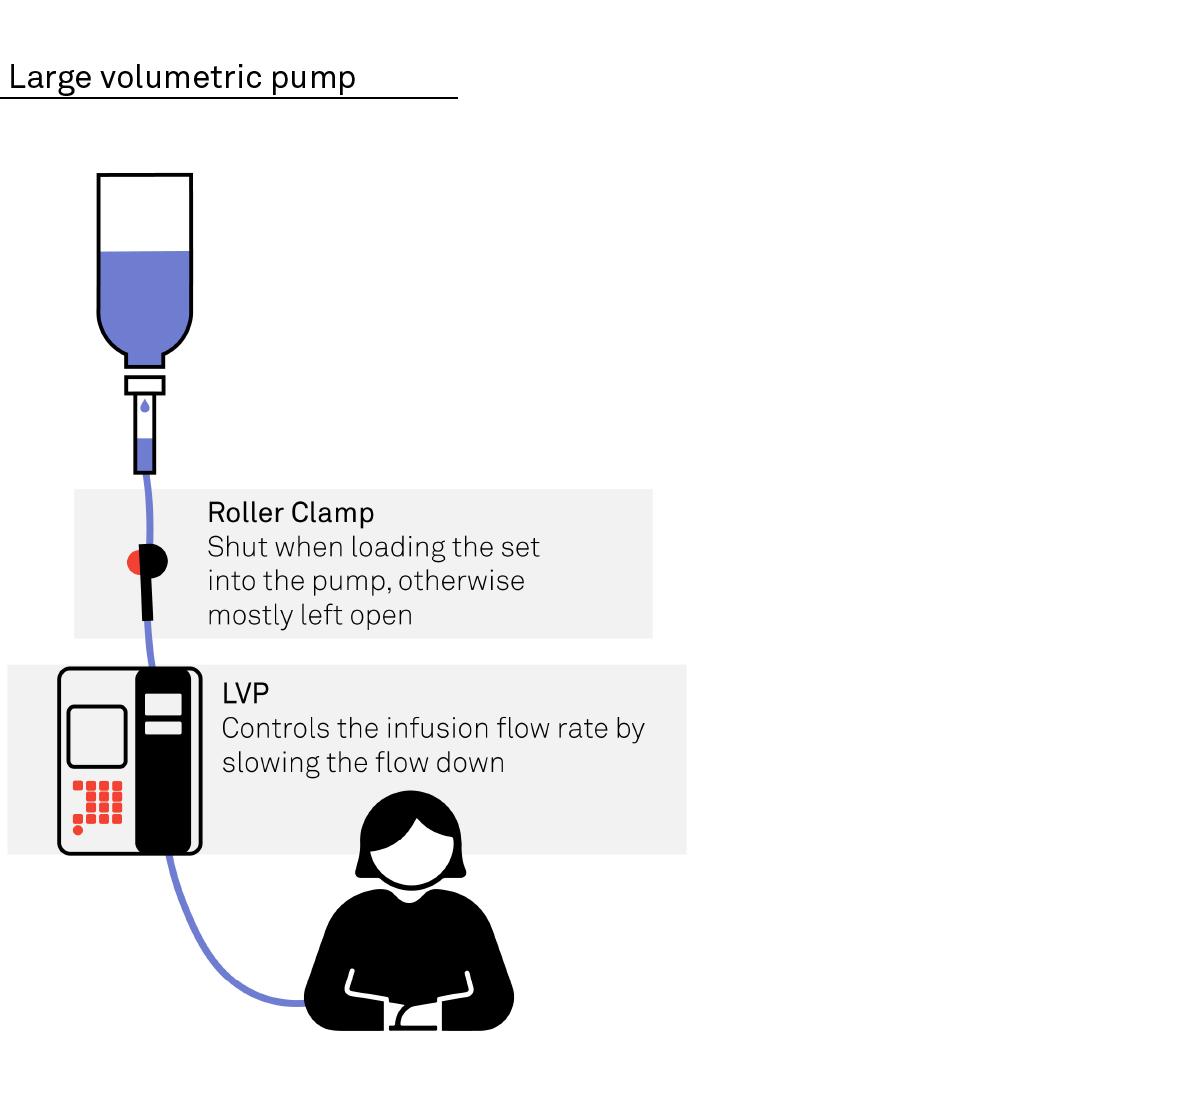 Diagram of how a large volumetric pump works